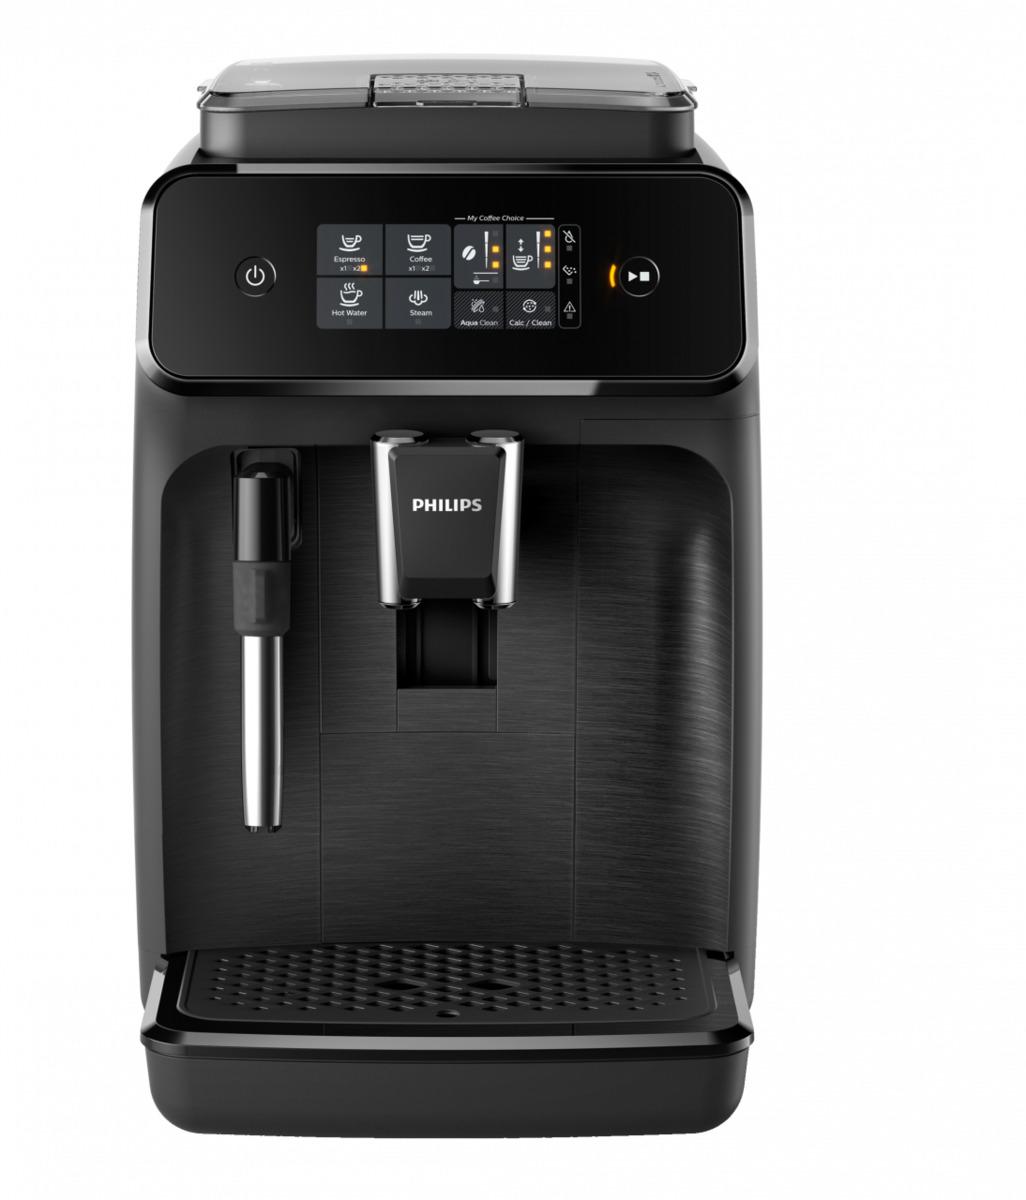 Bild 1 von Philips Kaffeevollautomat EP1220/00